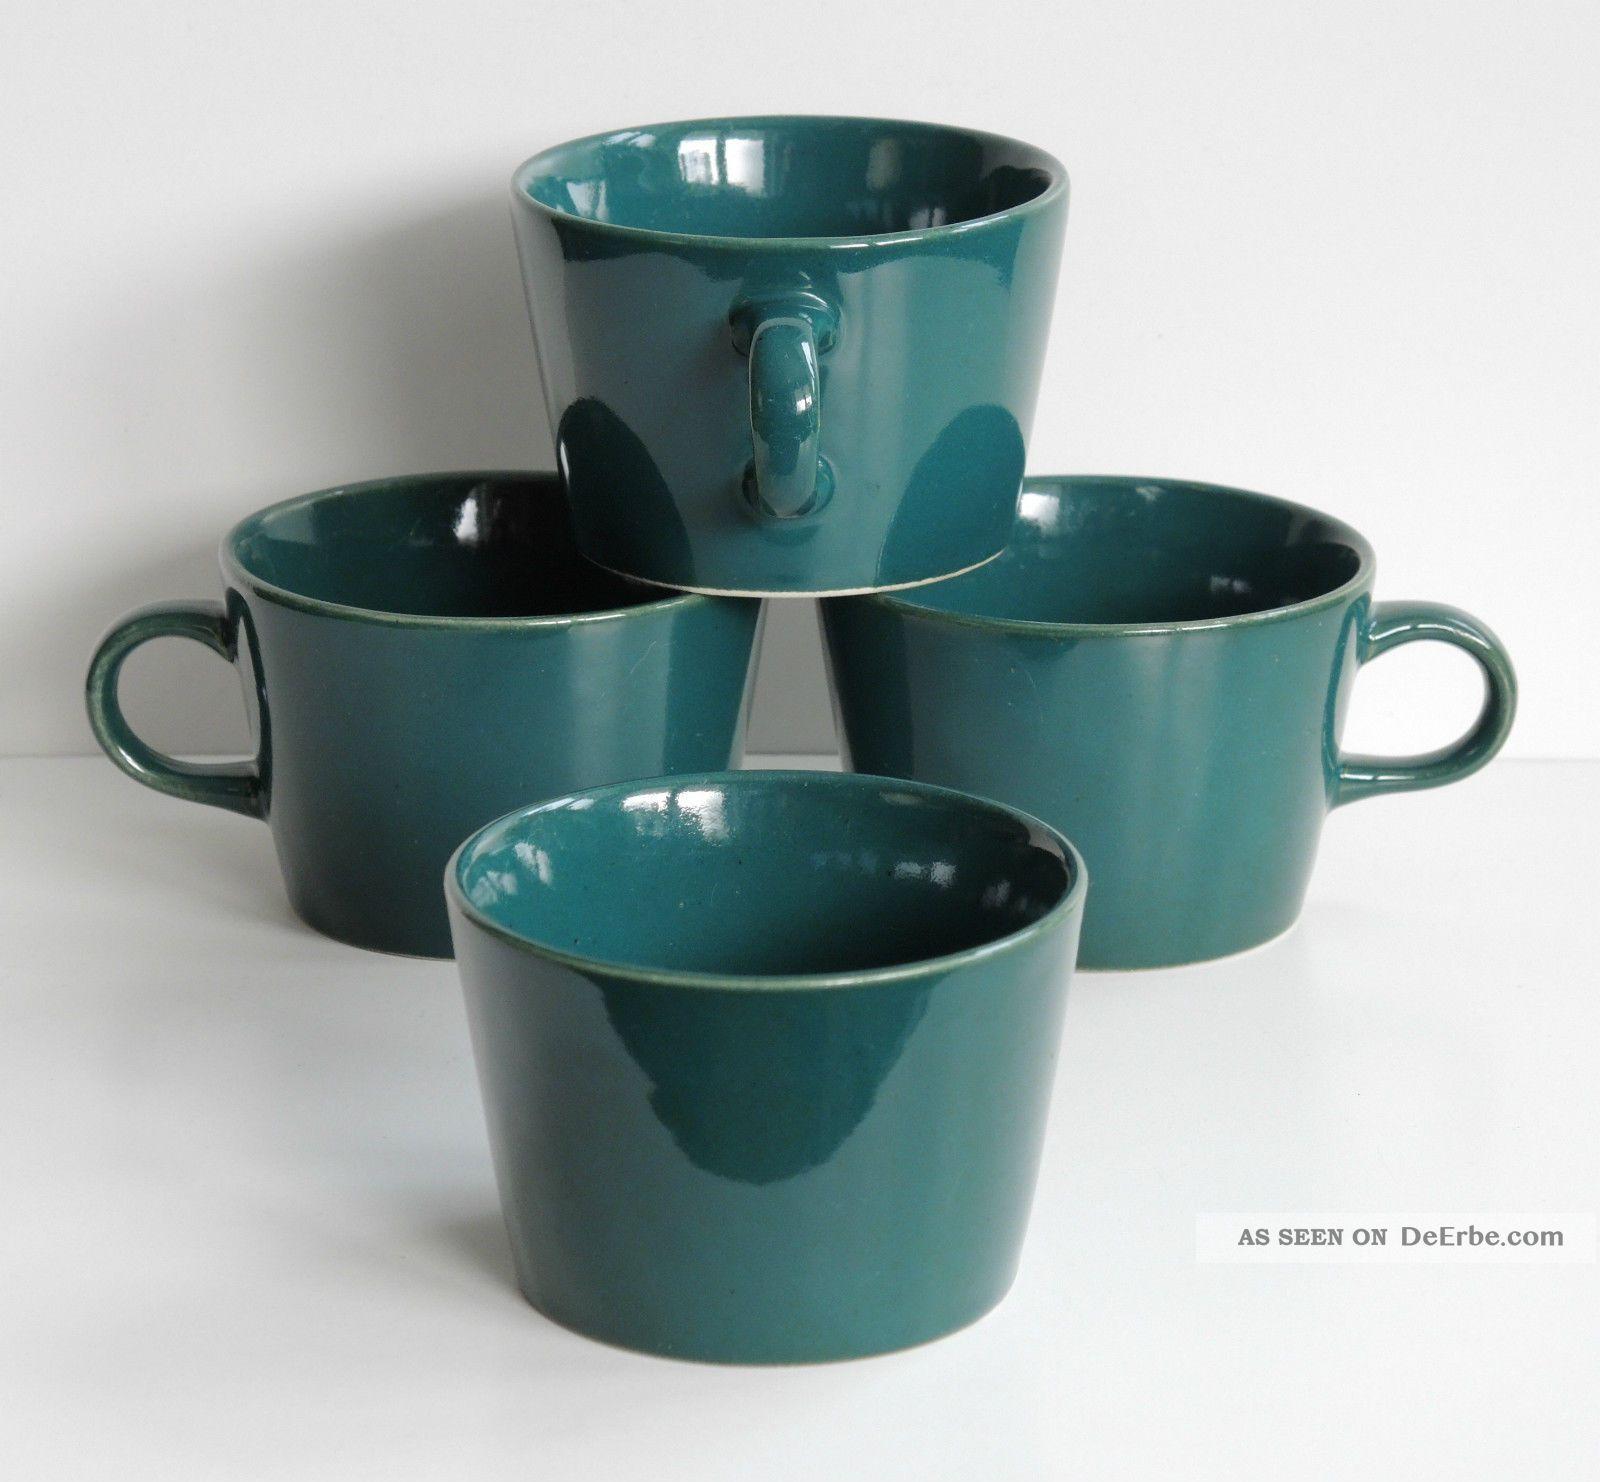 Arabia Finland Kilta Geschirr 3x Kaffeetasse U.  1 Zuckertopf Grün Kaj Franck 1950-1959 Bild